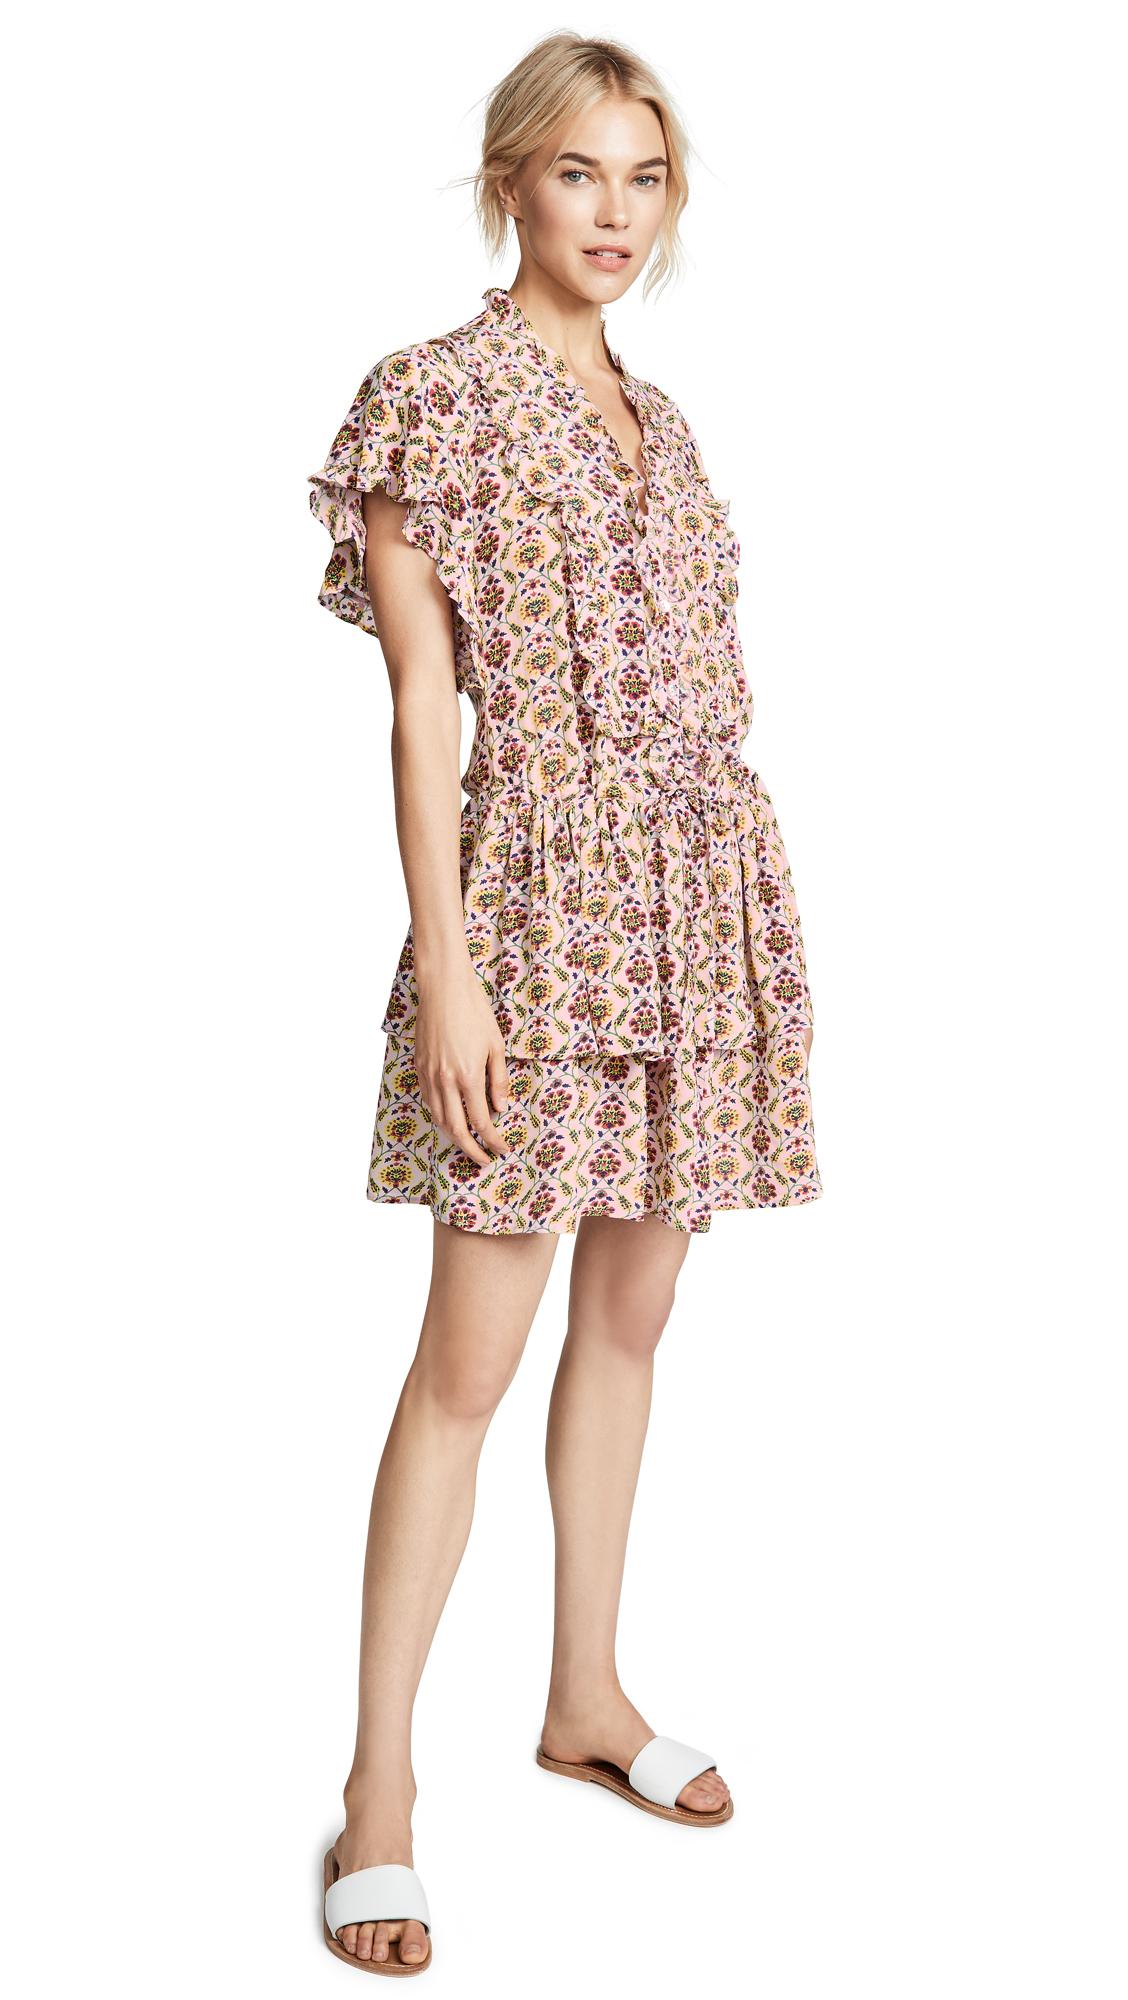 Banjanan Suki Dress